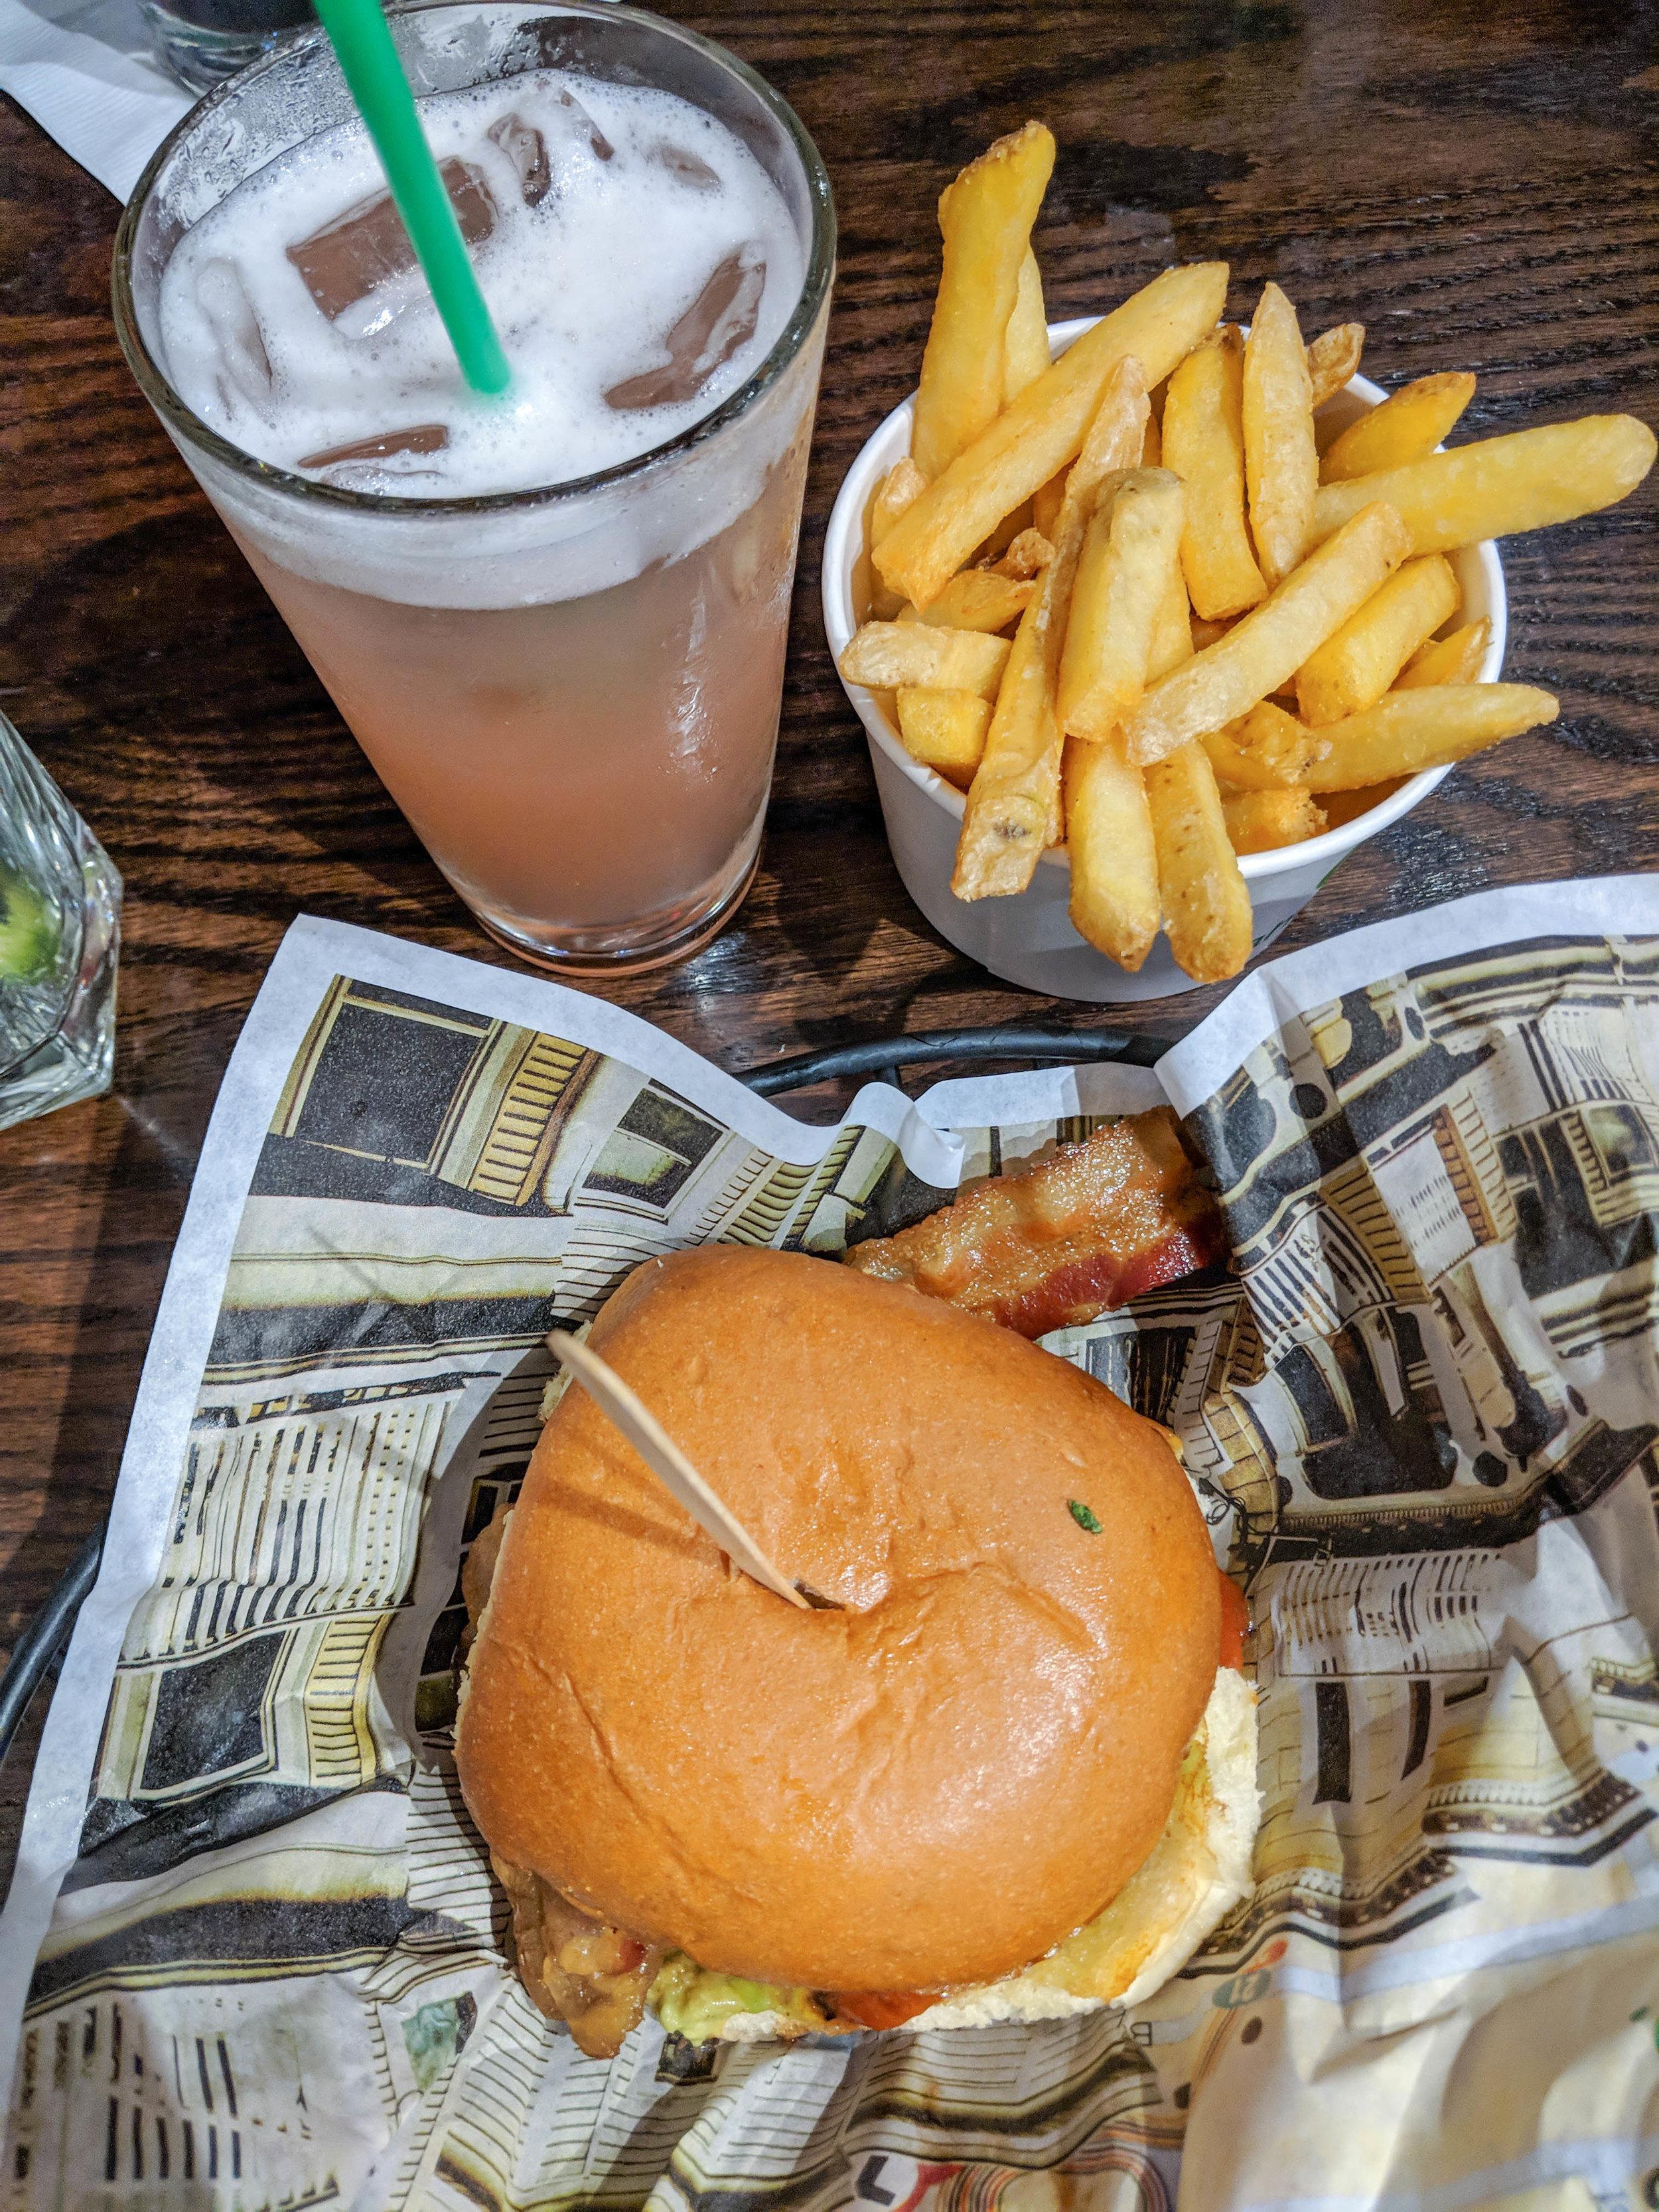 bri rinehart; photography; food; boston; whalburger's; fenway